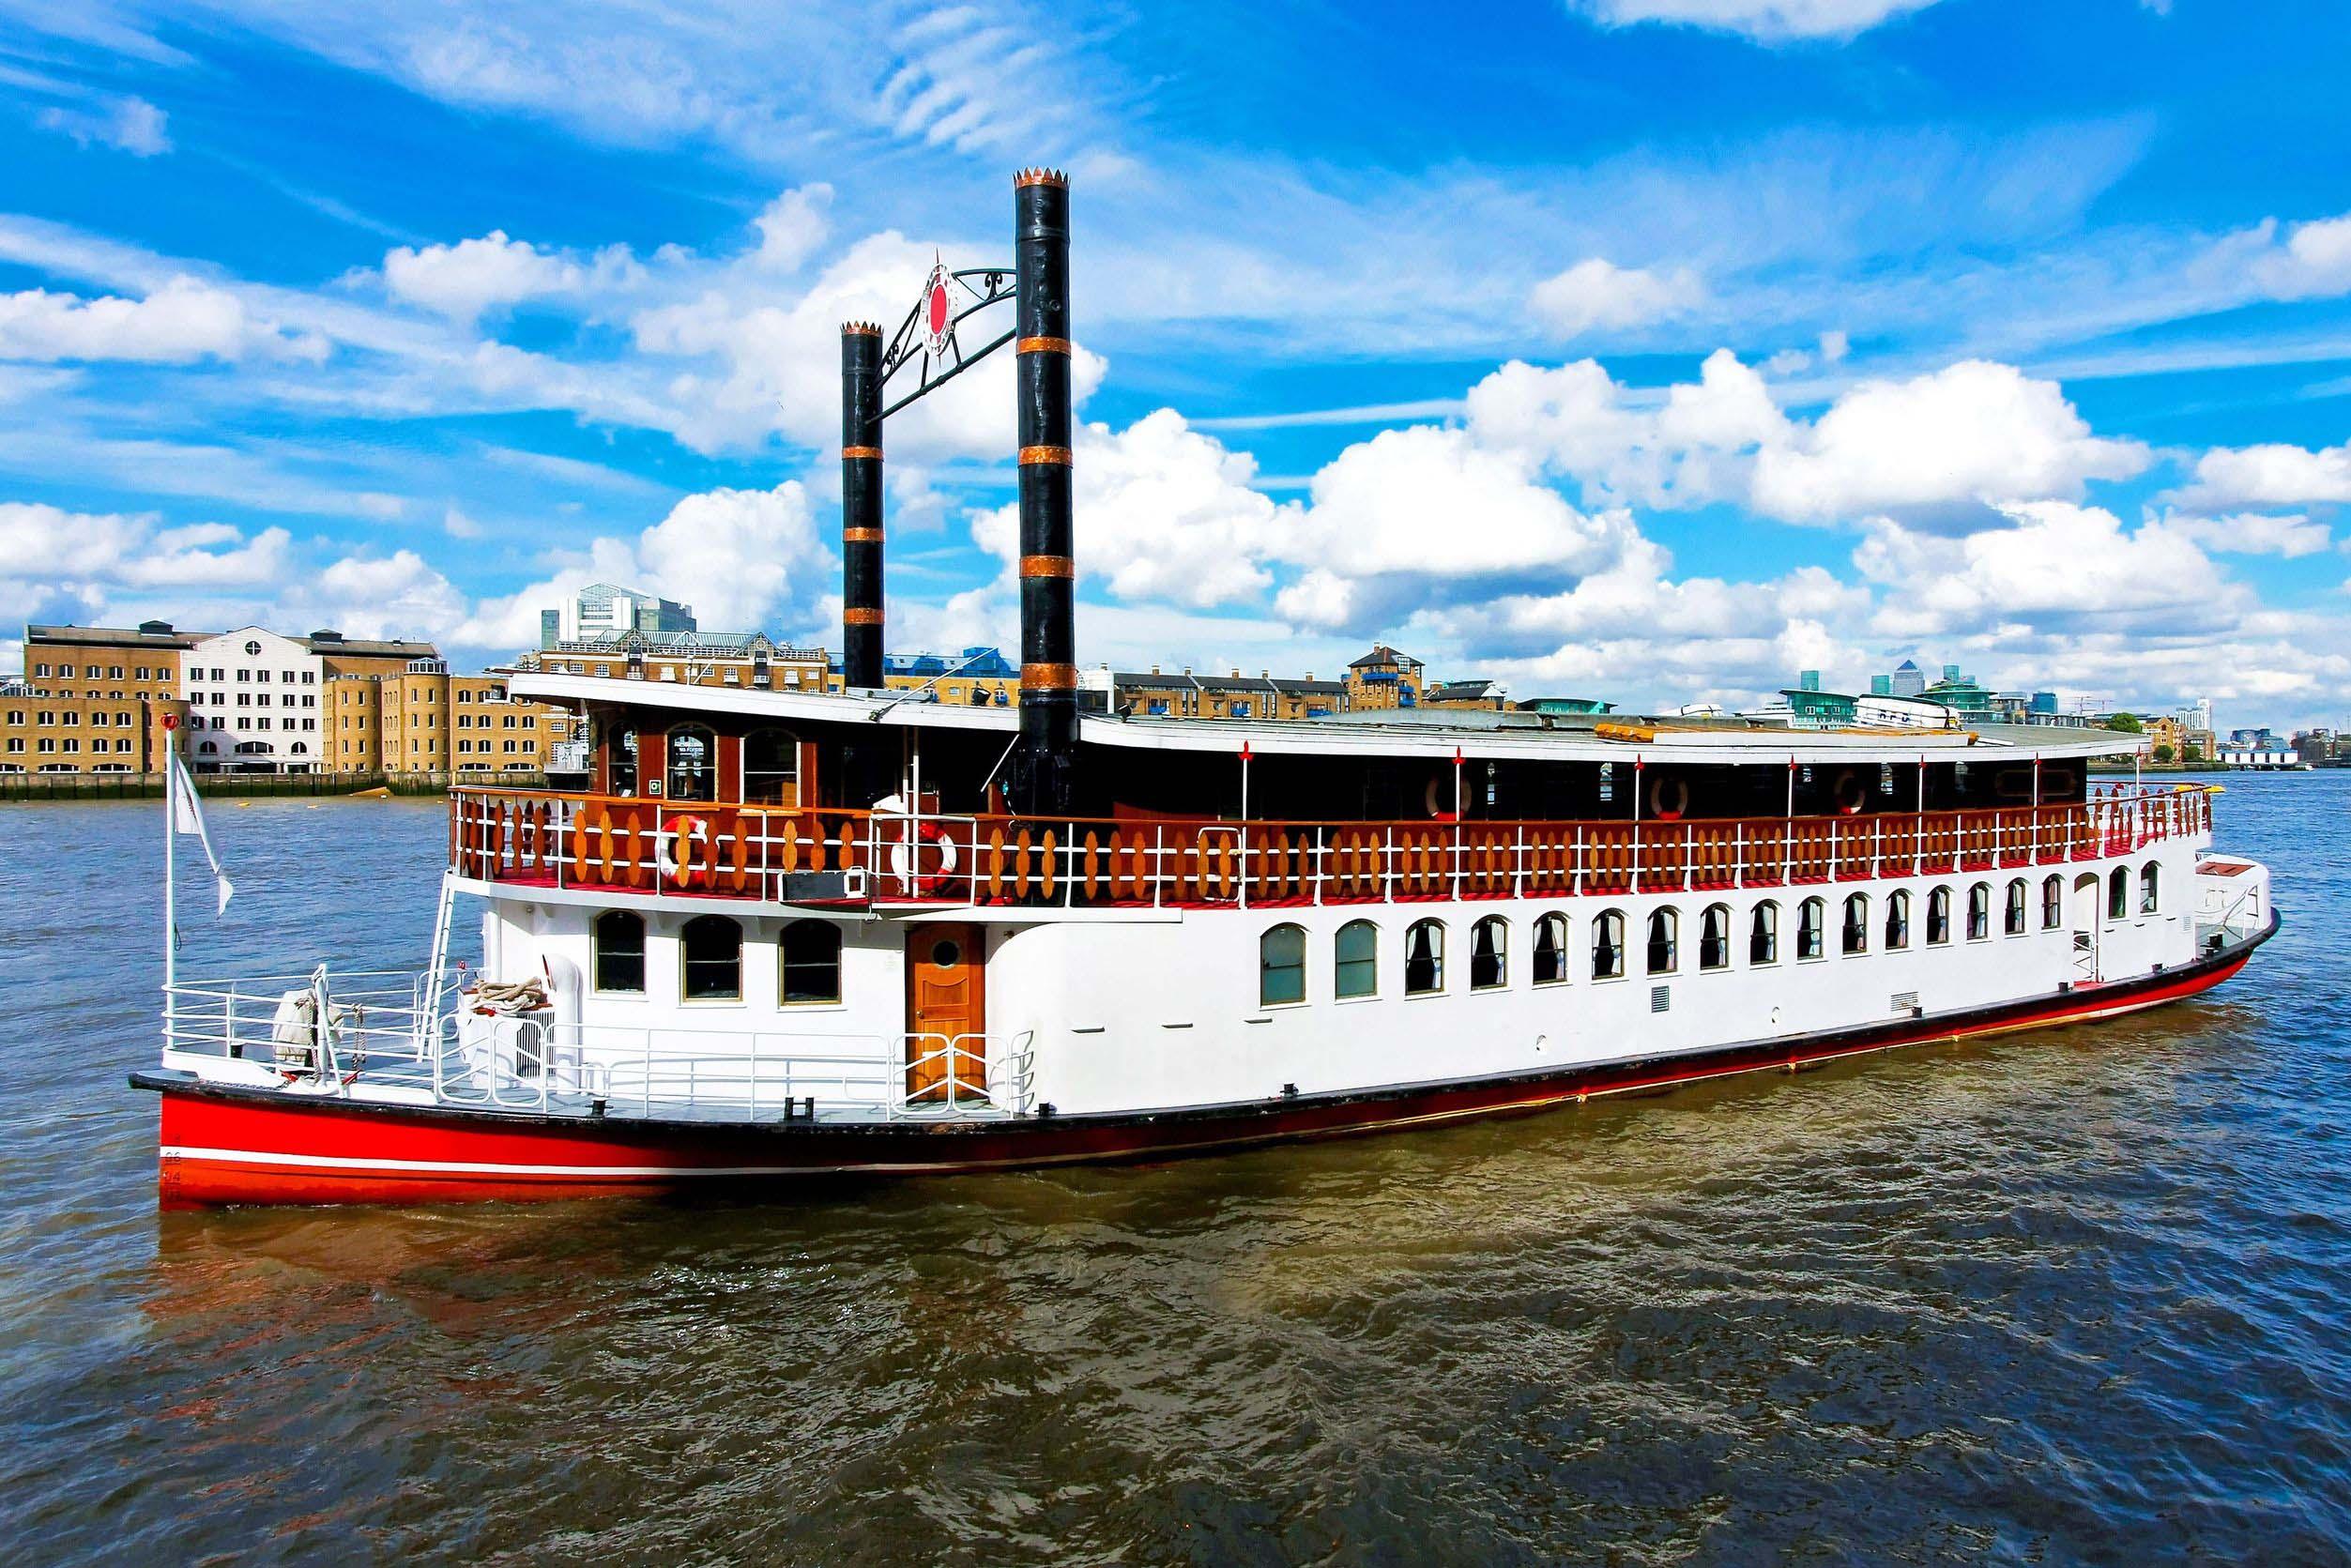 olf-fashioned-steam-boat-missouri-usa